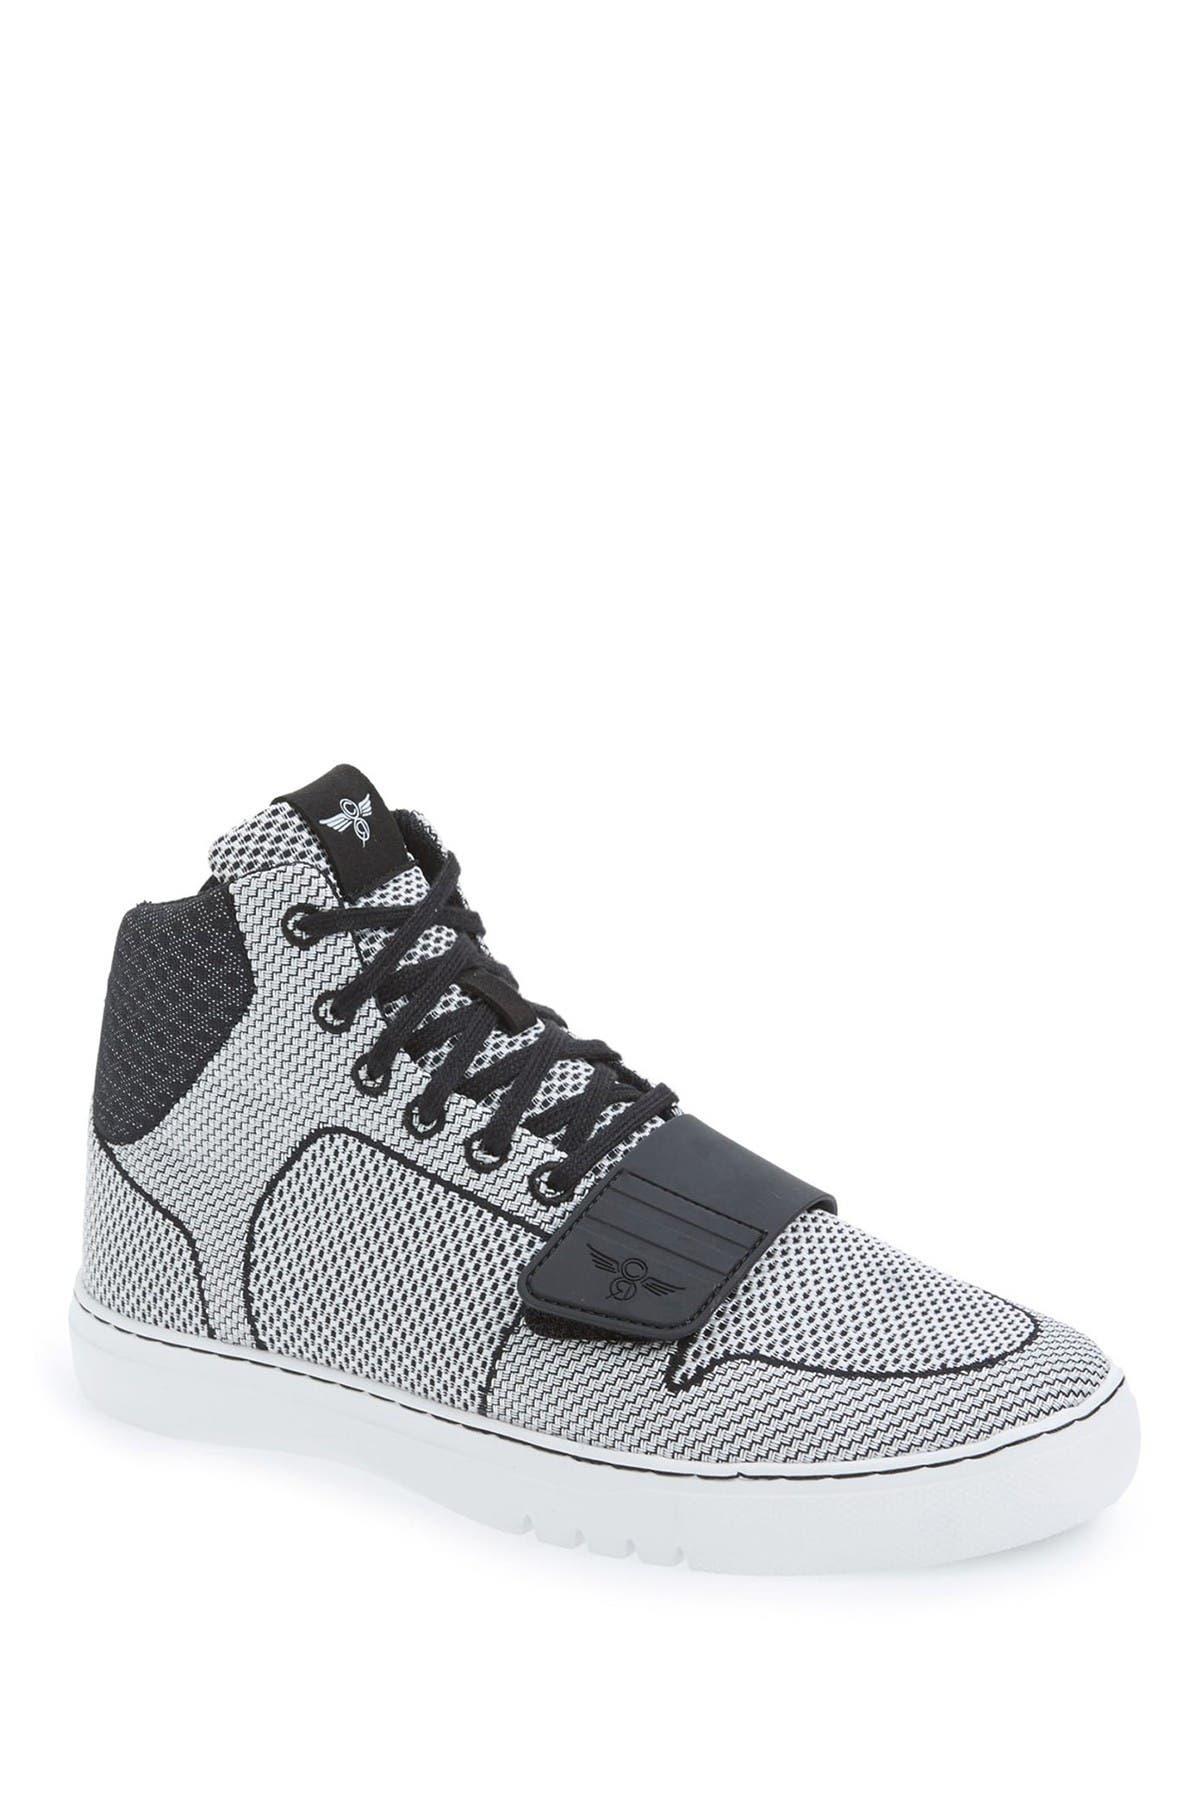 Image of Creative Recreation Cesario Hi Woven Sneaker